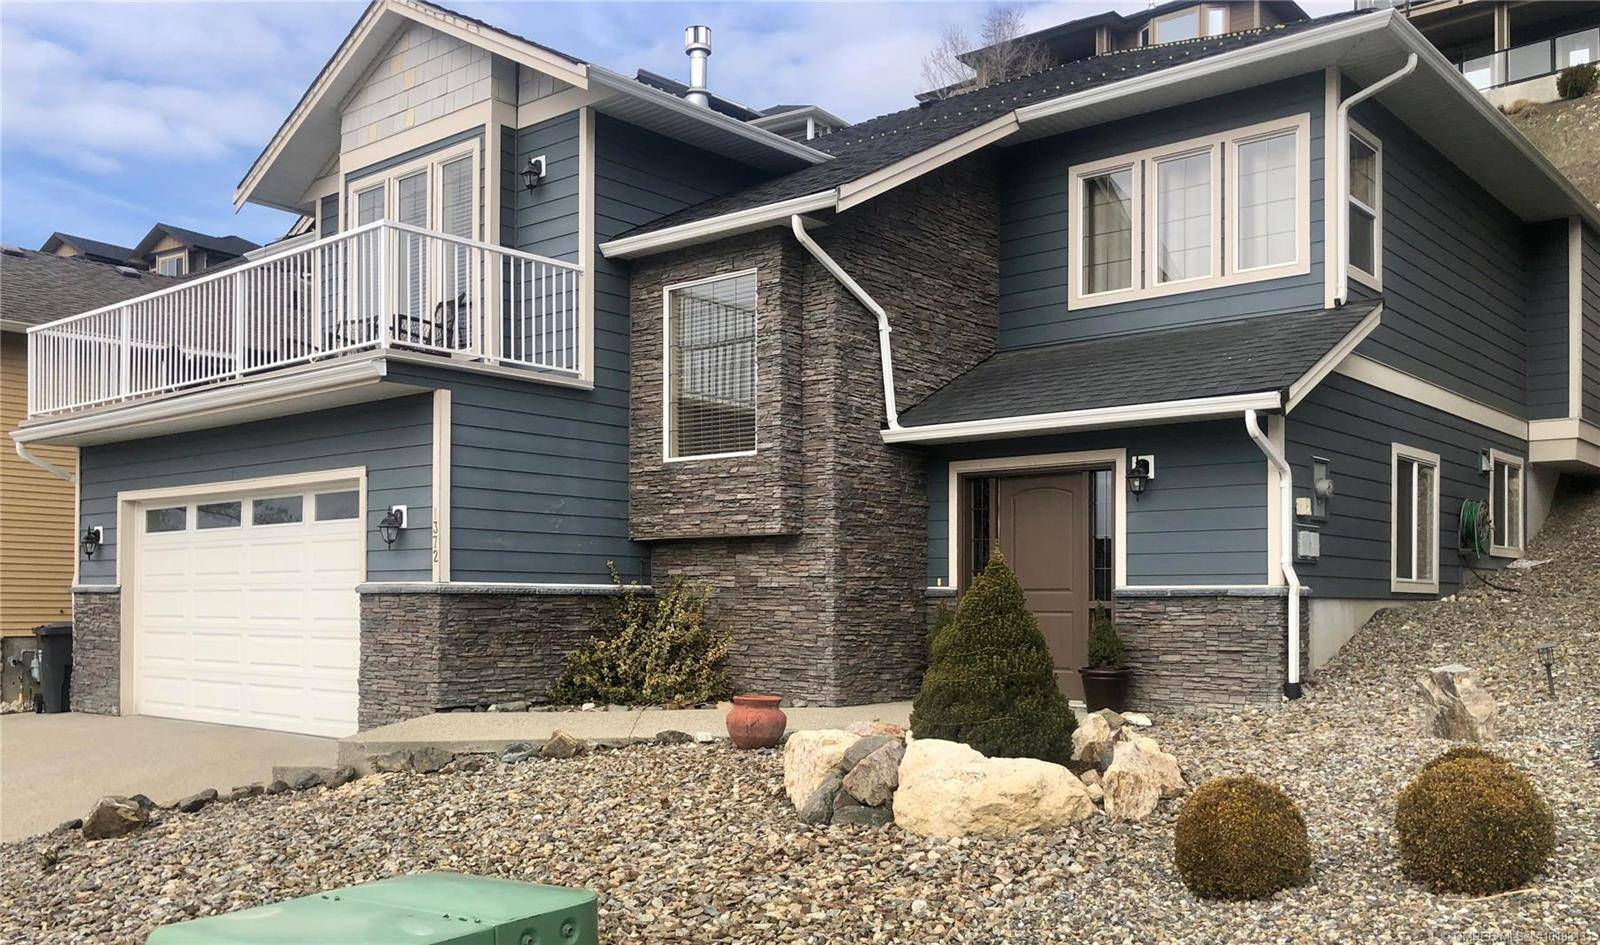 House for sale at 1372 Feedham Ave Kelowna British Columbia - MLS: 10198131